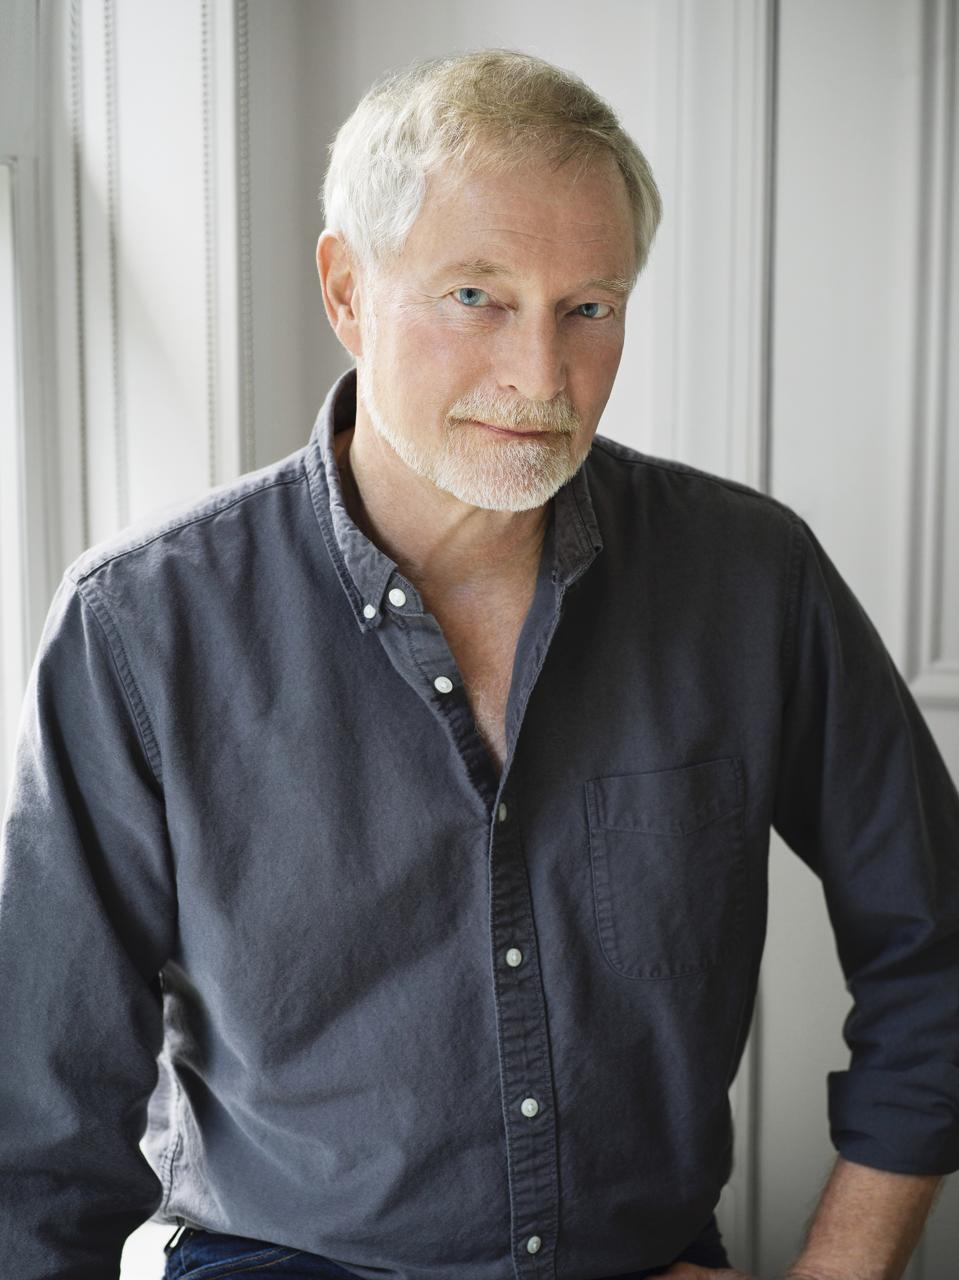 Bestselling author Erik Larson